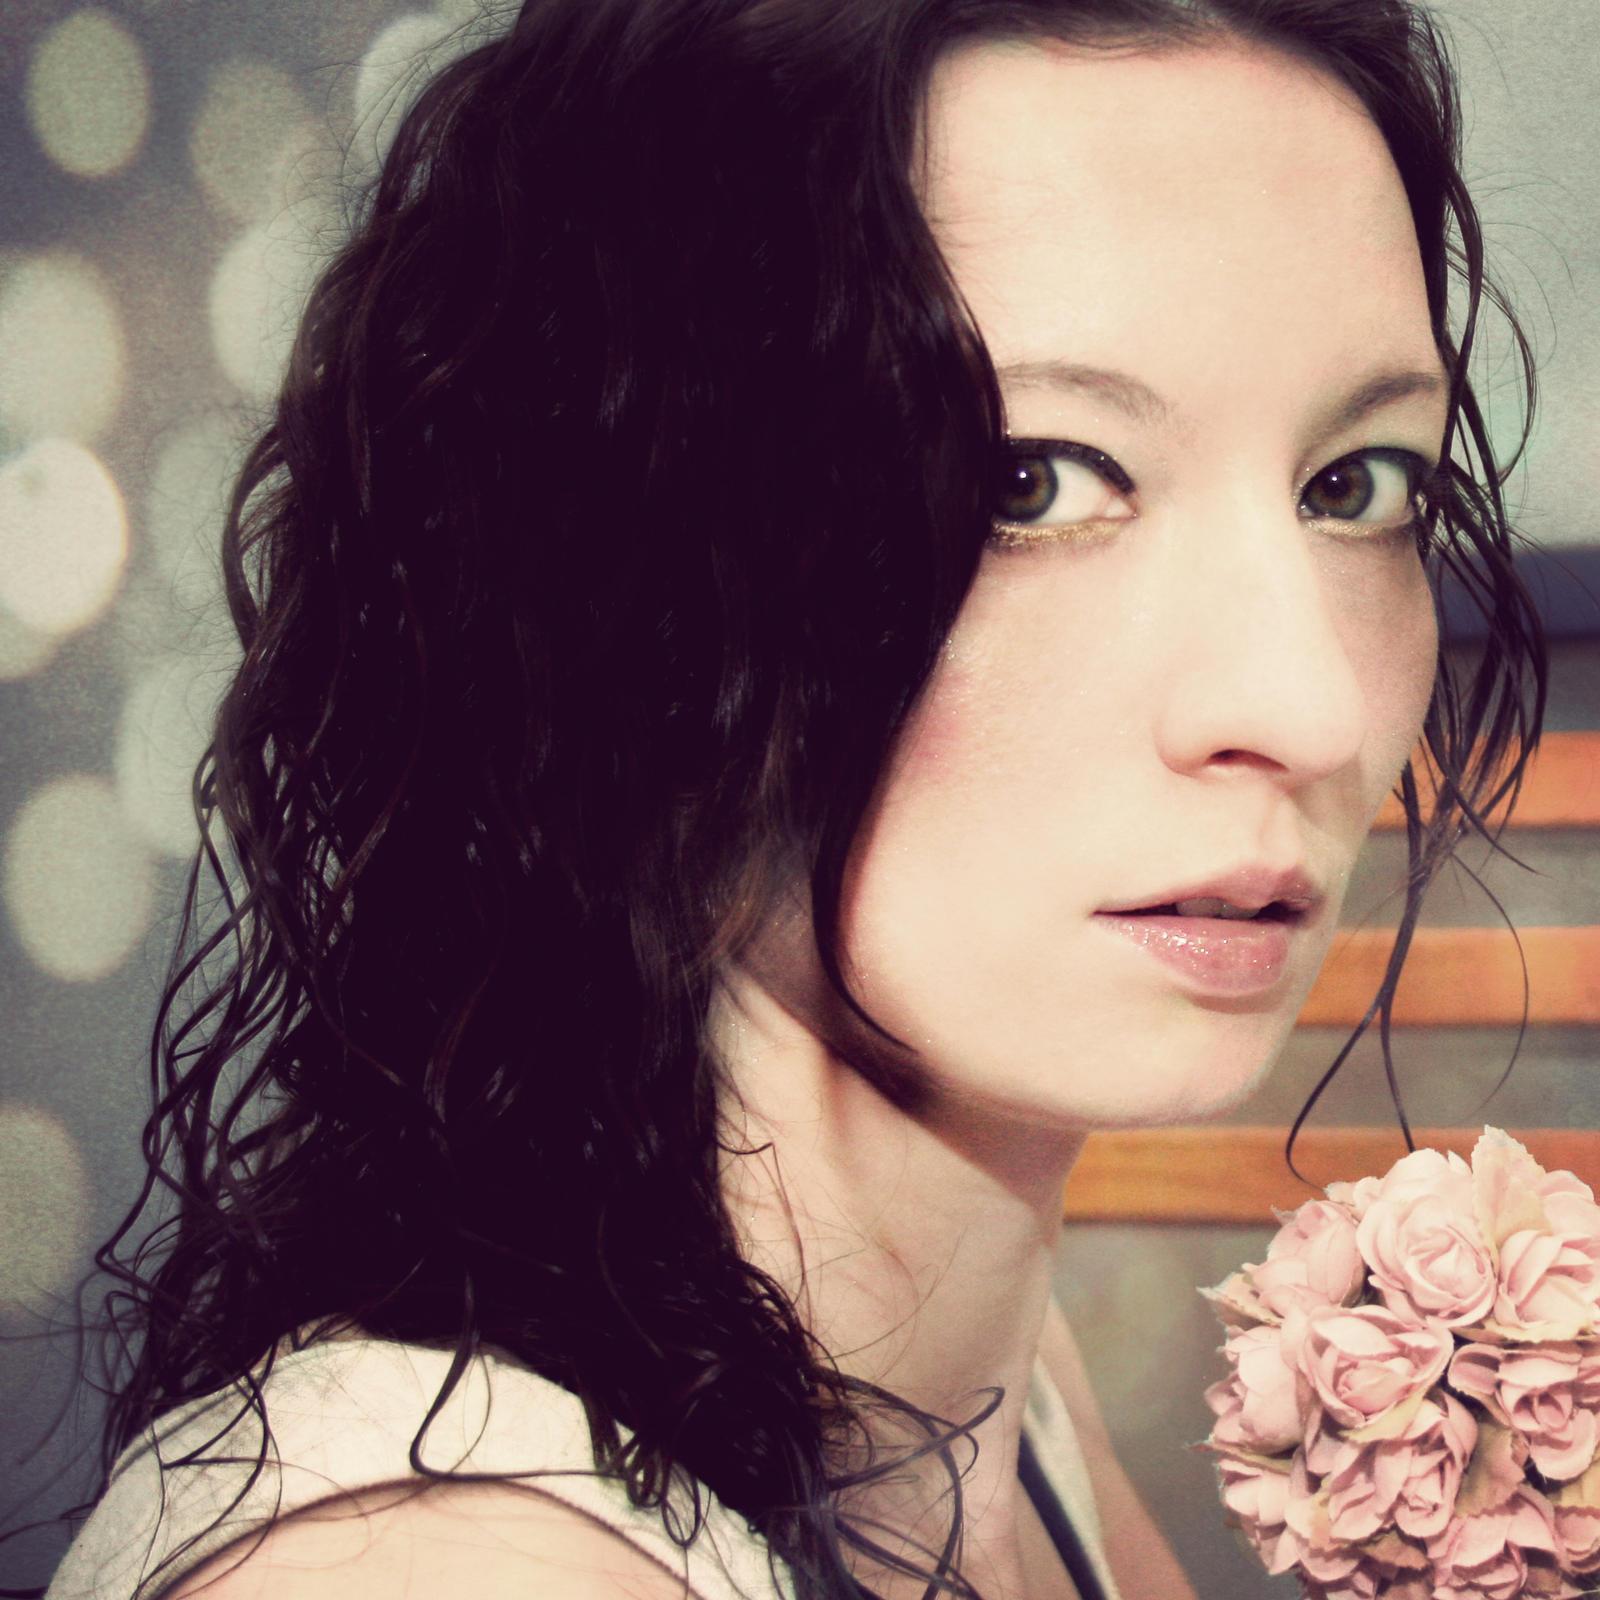 Karolina-Borkowski's Profile Picture